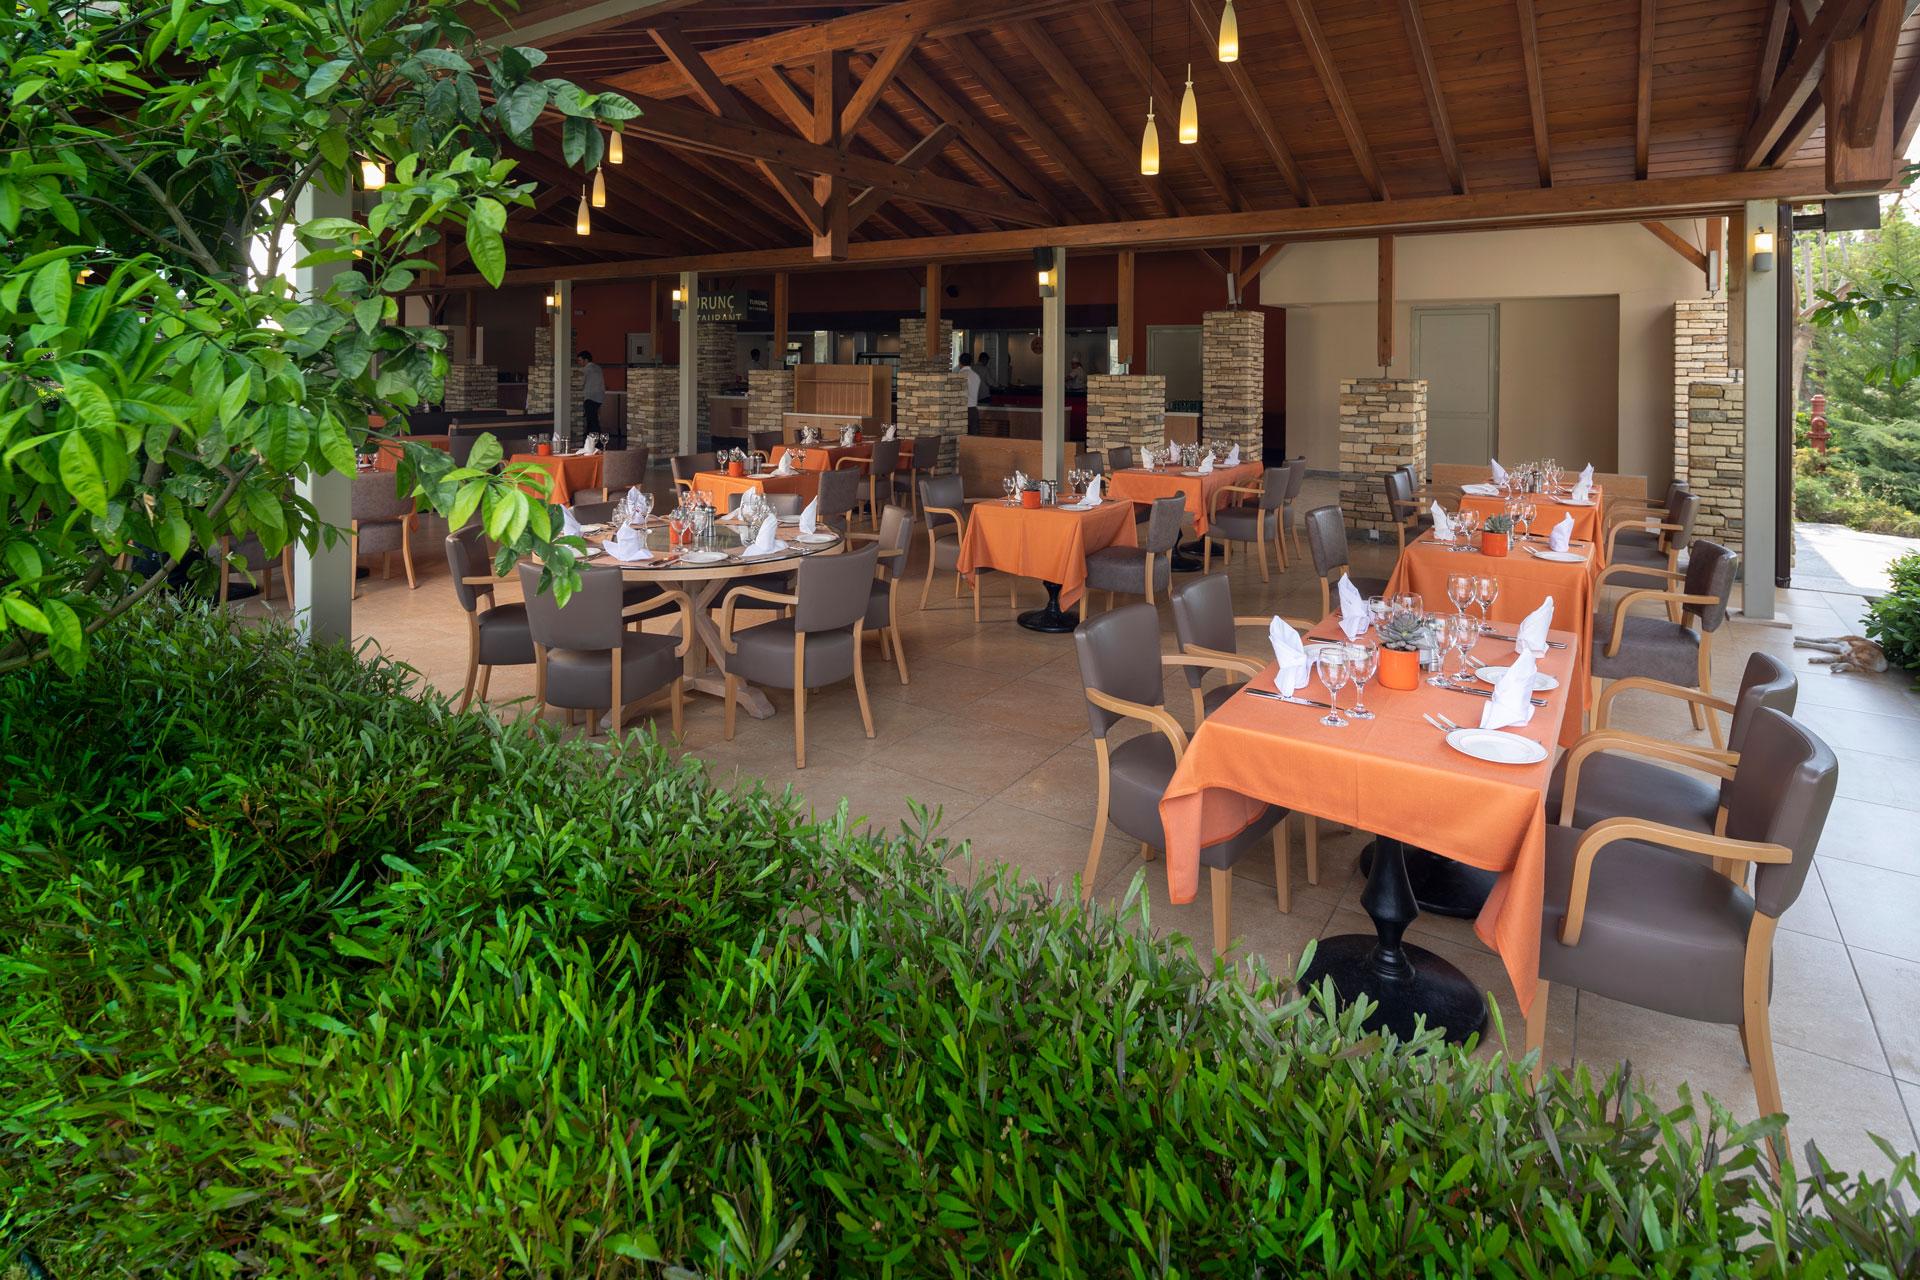 Turunç All-Day Dining À La Carte Restaurant